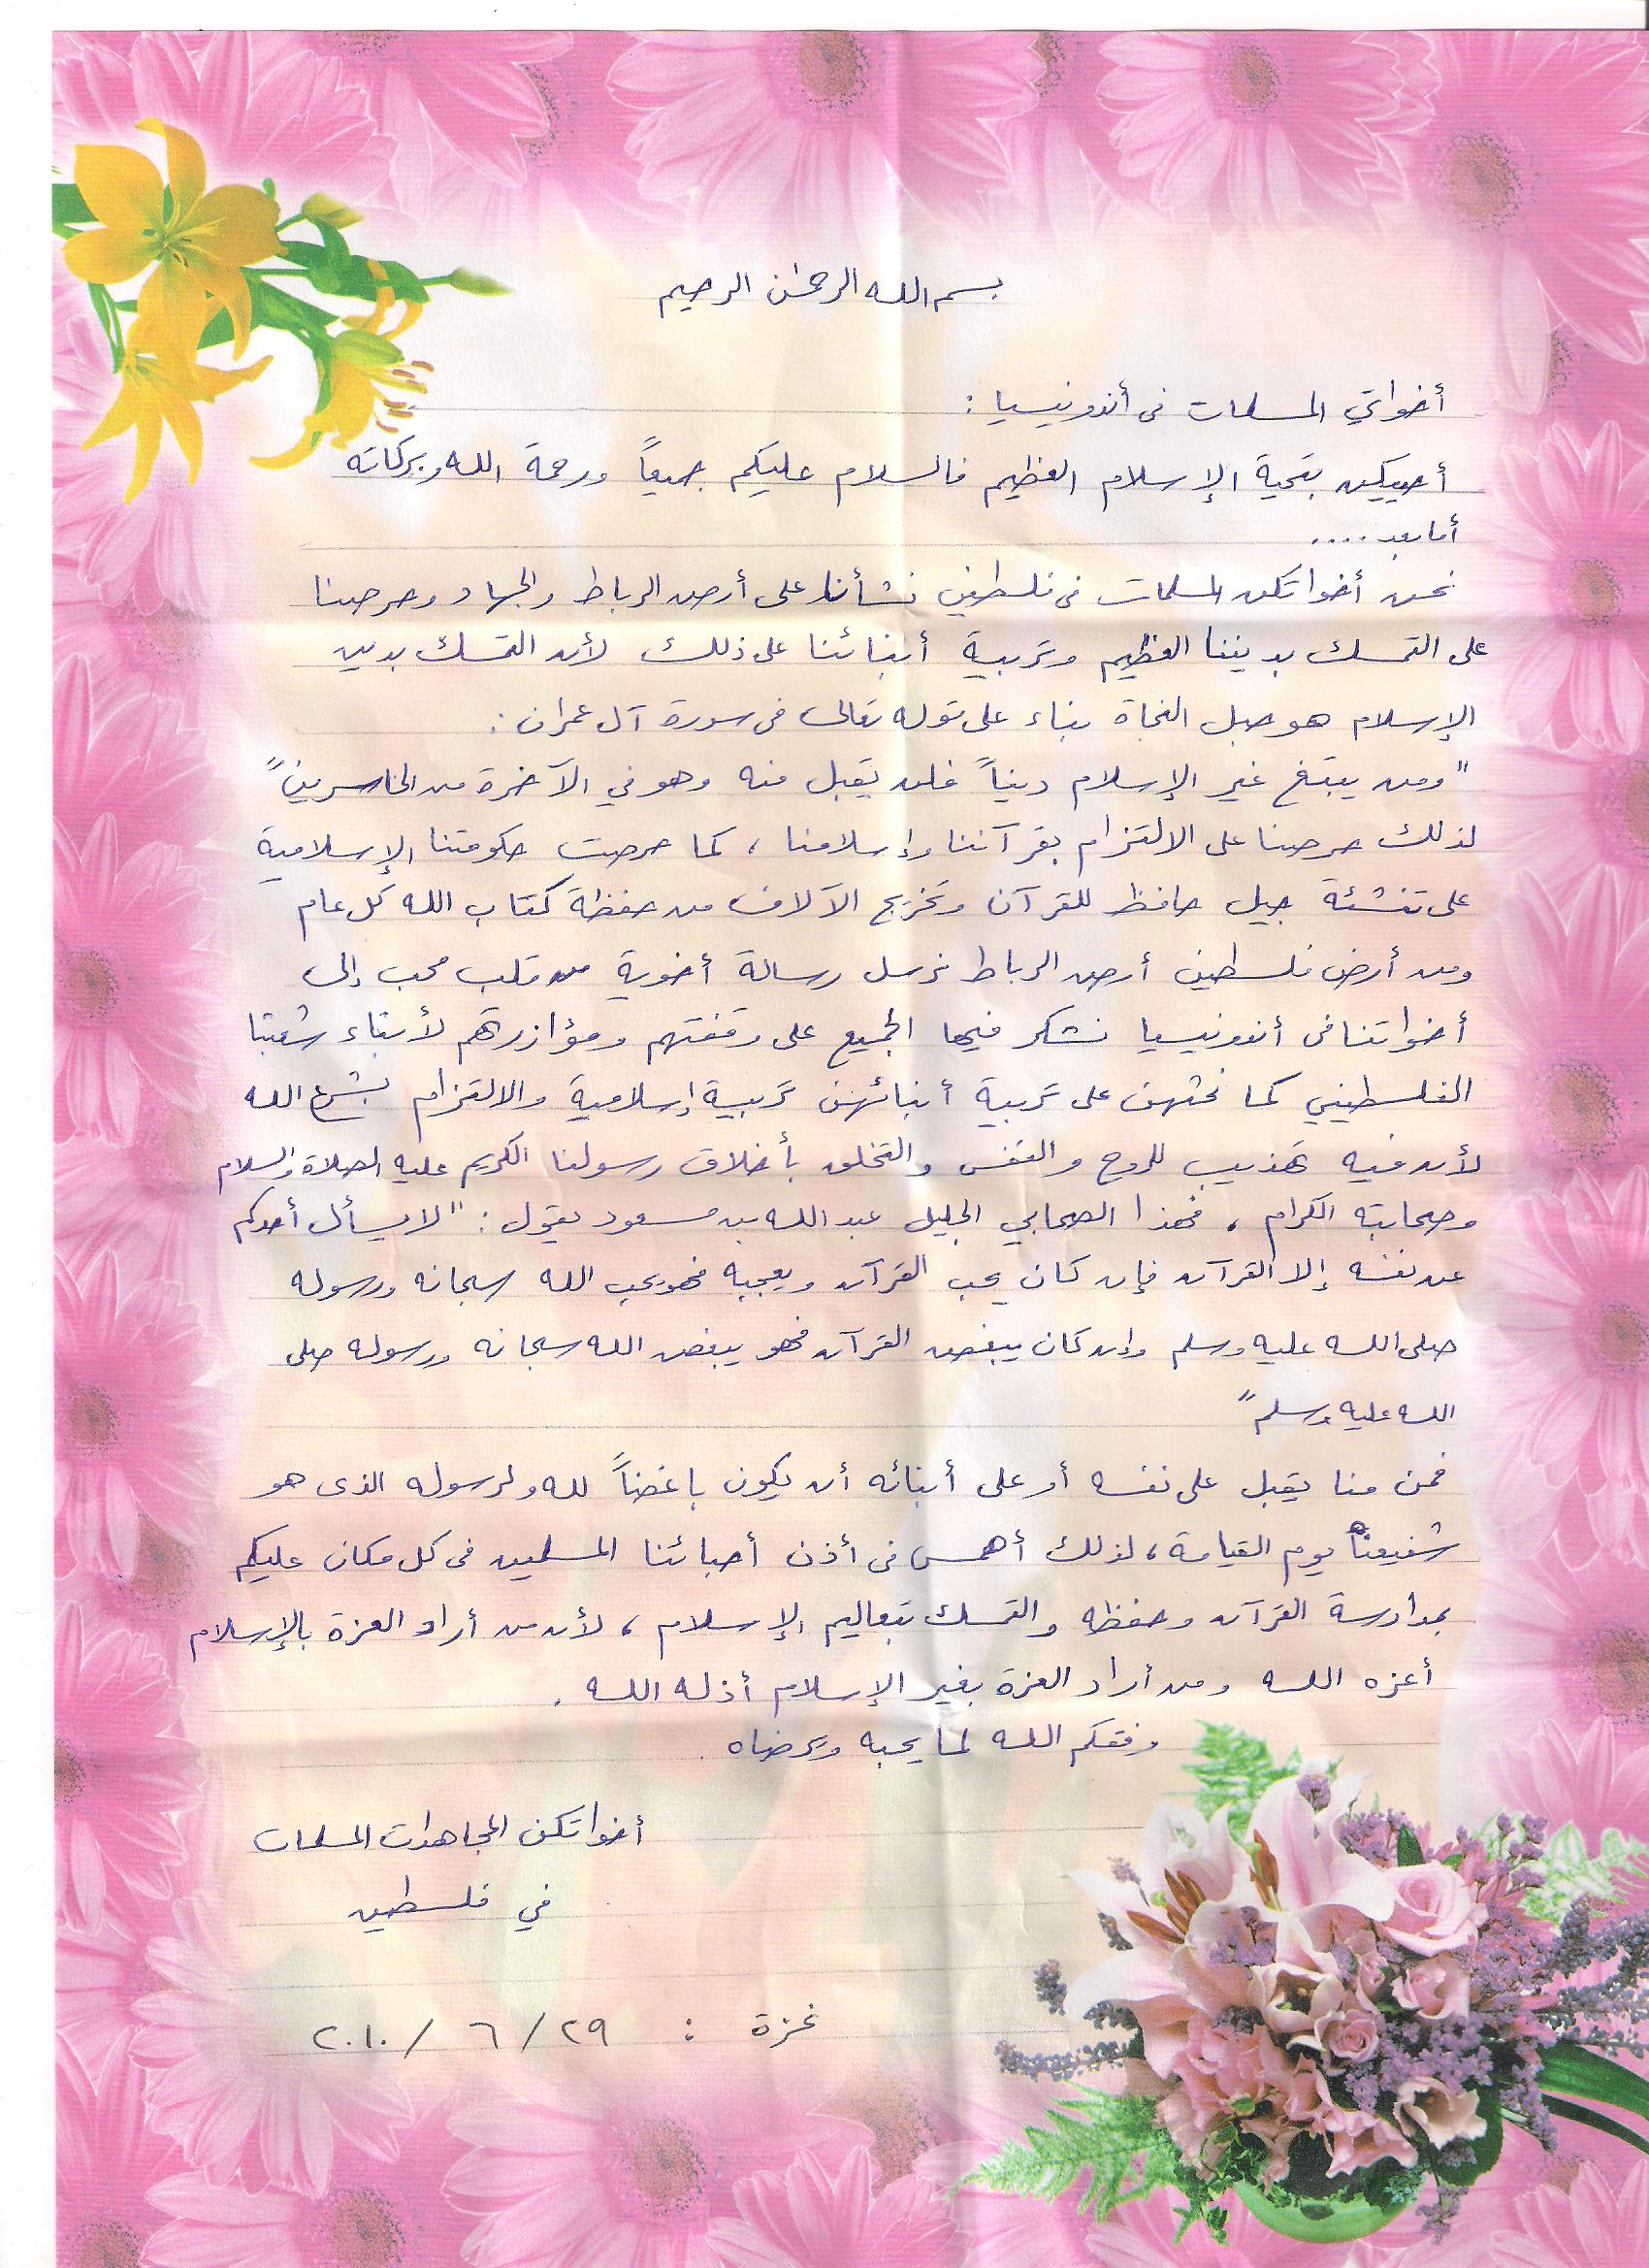 Surat AKhwat palestina 001